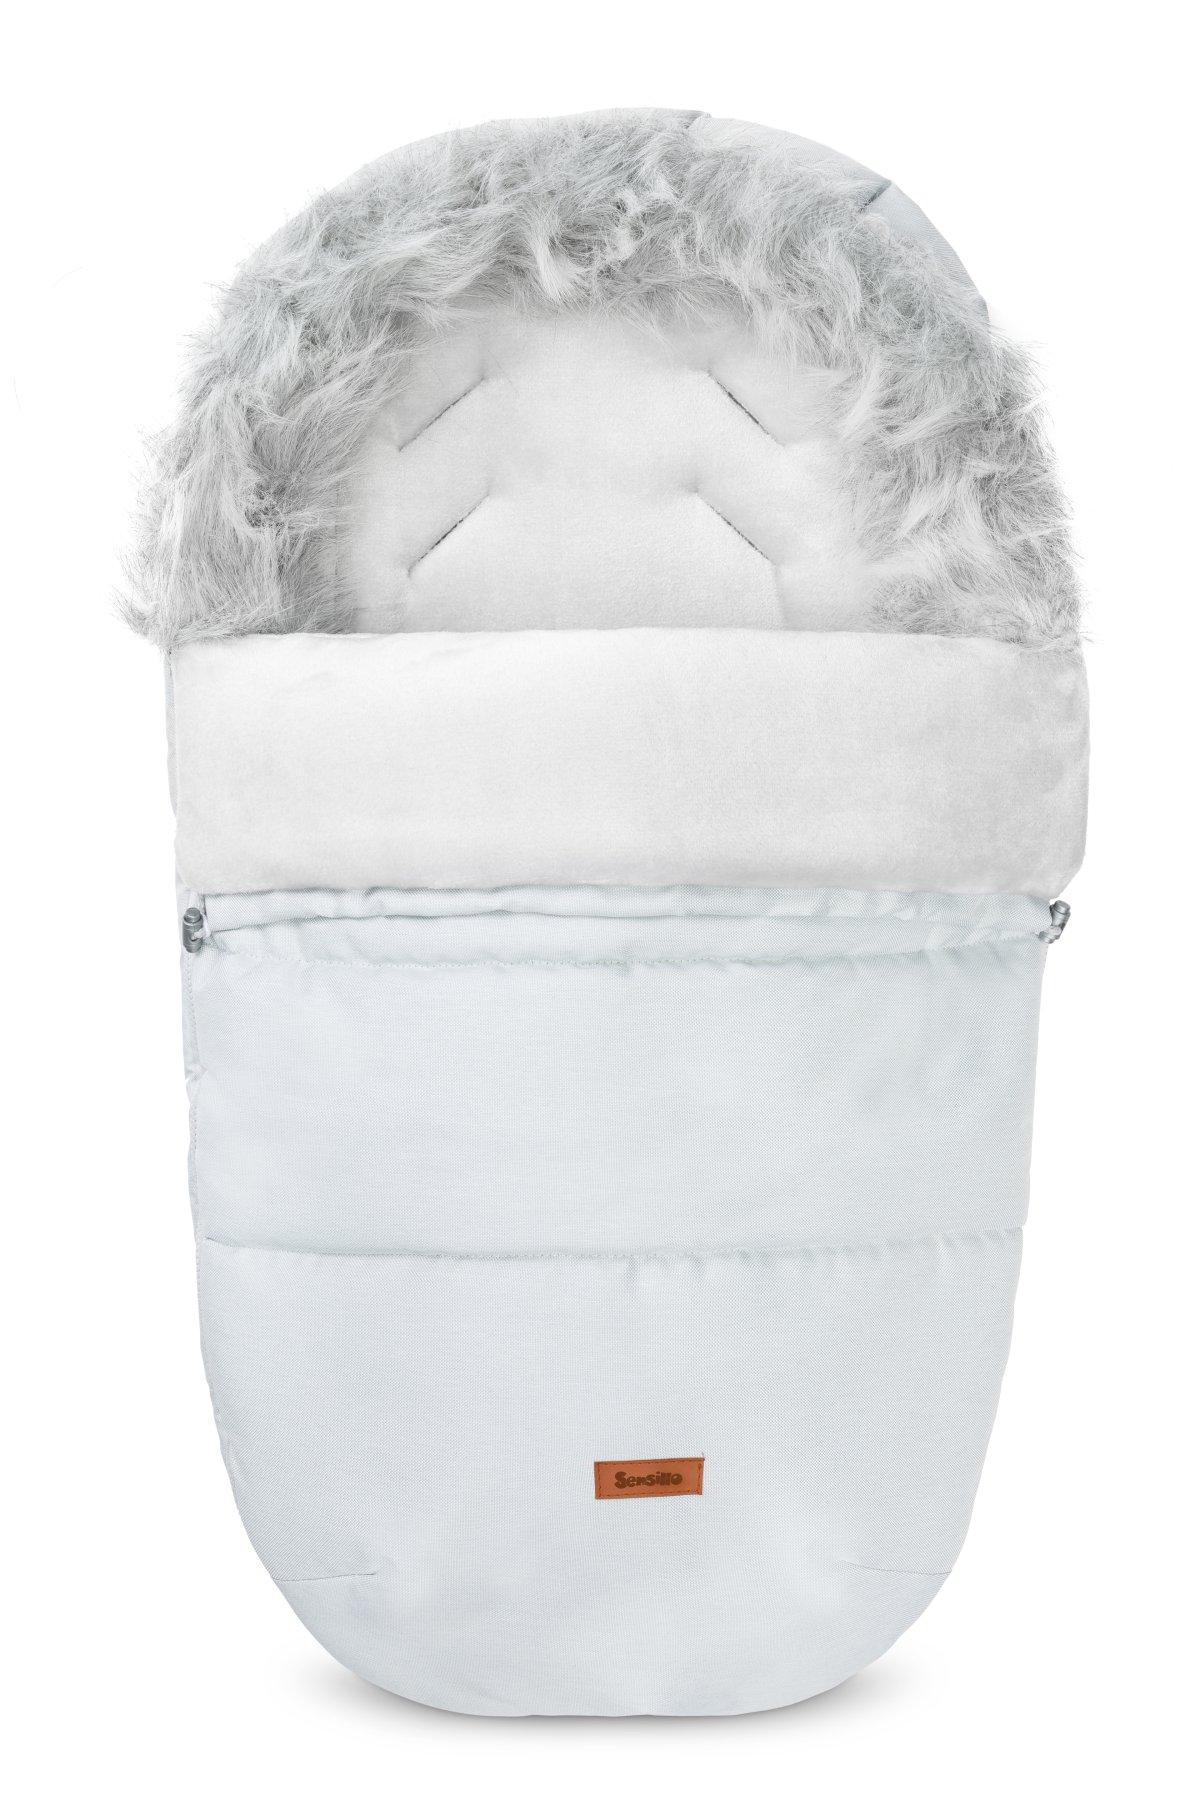 Indiana Romper Bag – ash